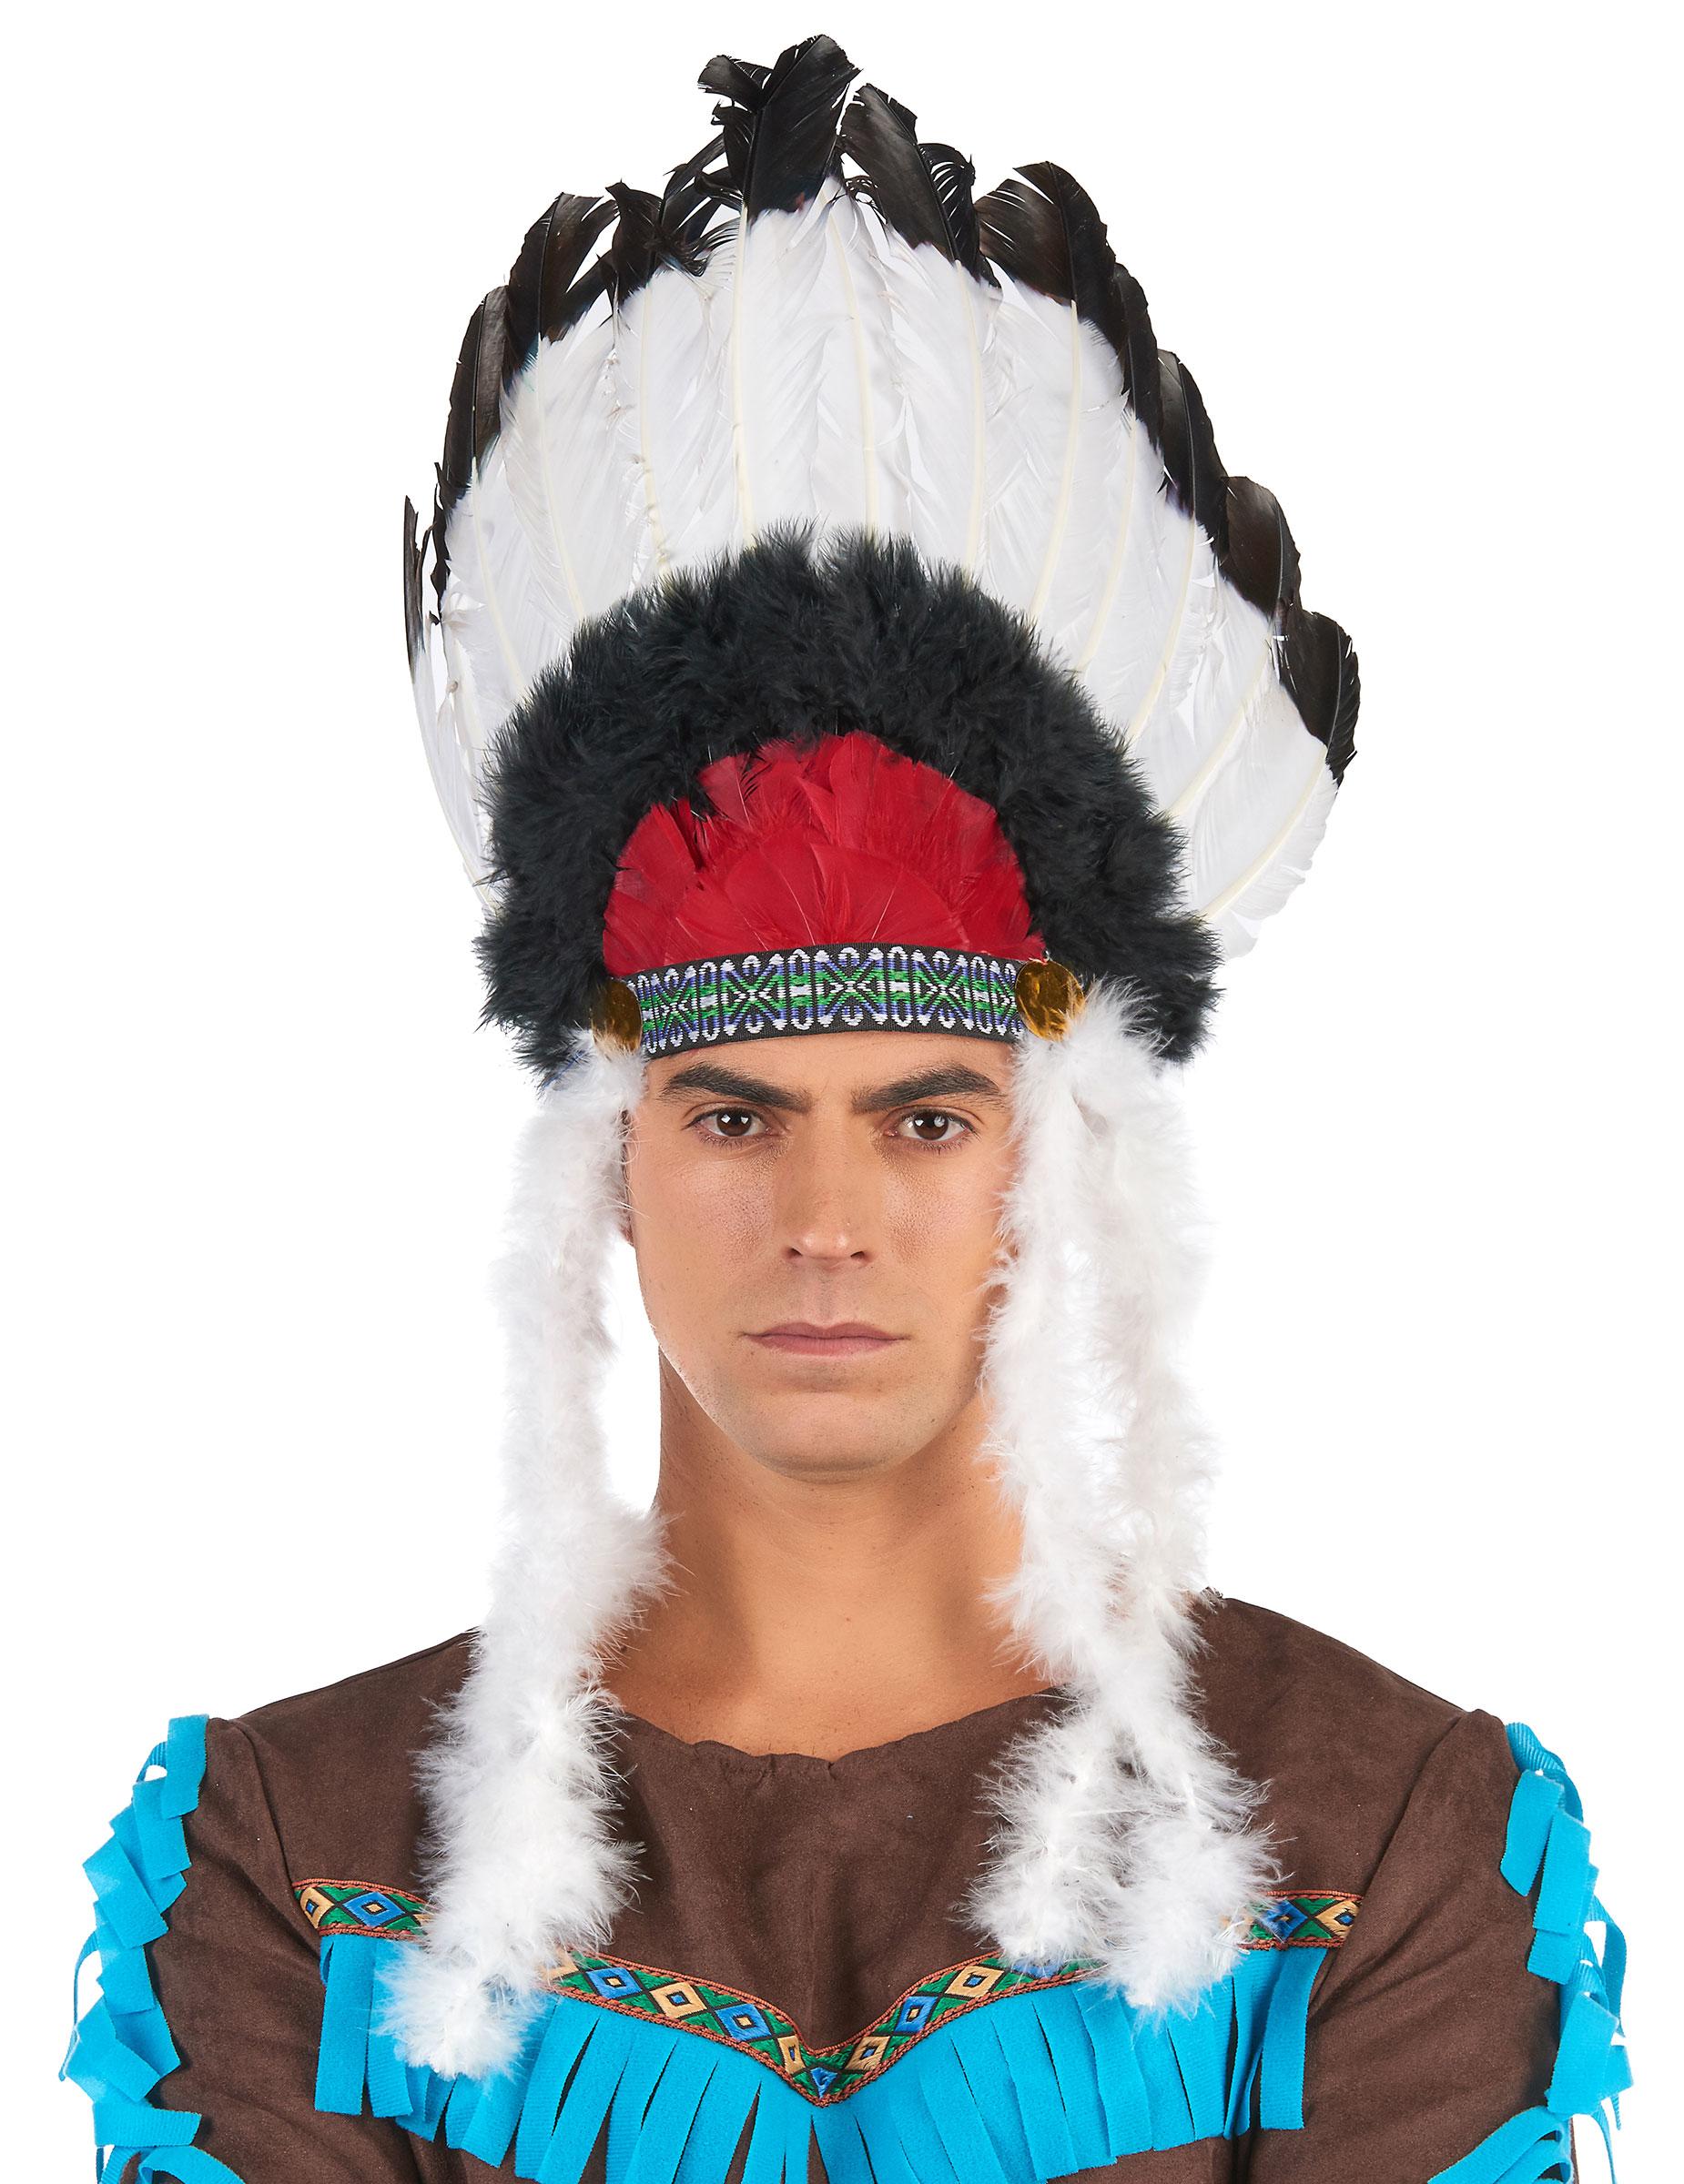 Maquillage indien adulte interesting dguisement adulte homme et femme carnaval halloween - Maquillage indien homme ...